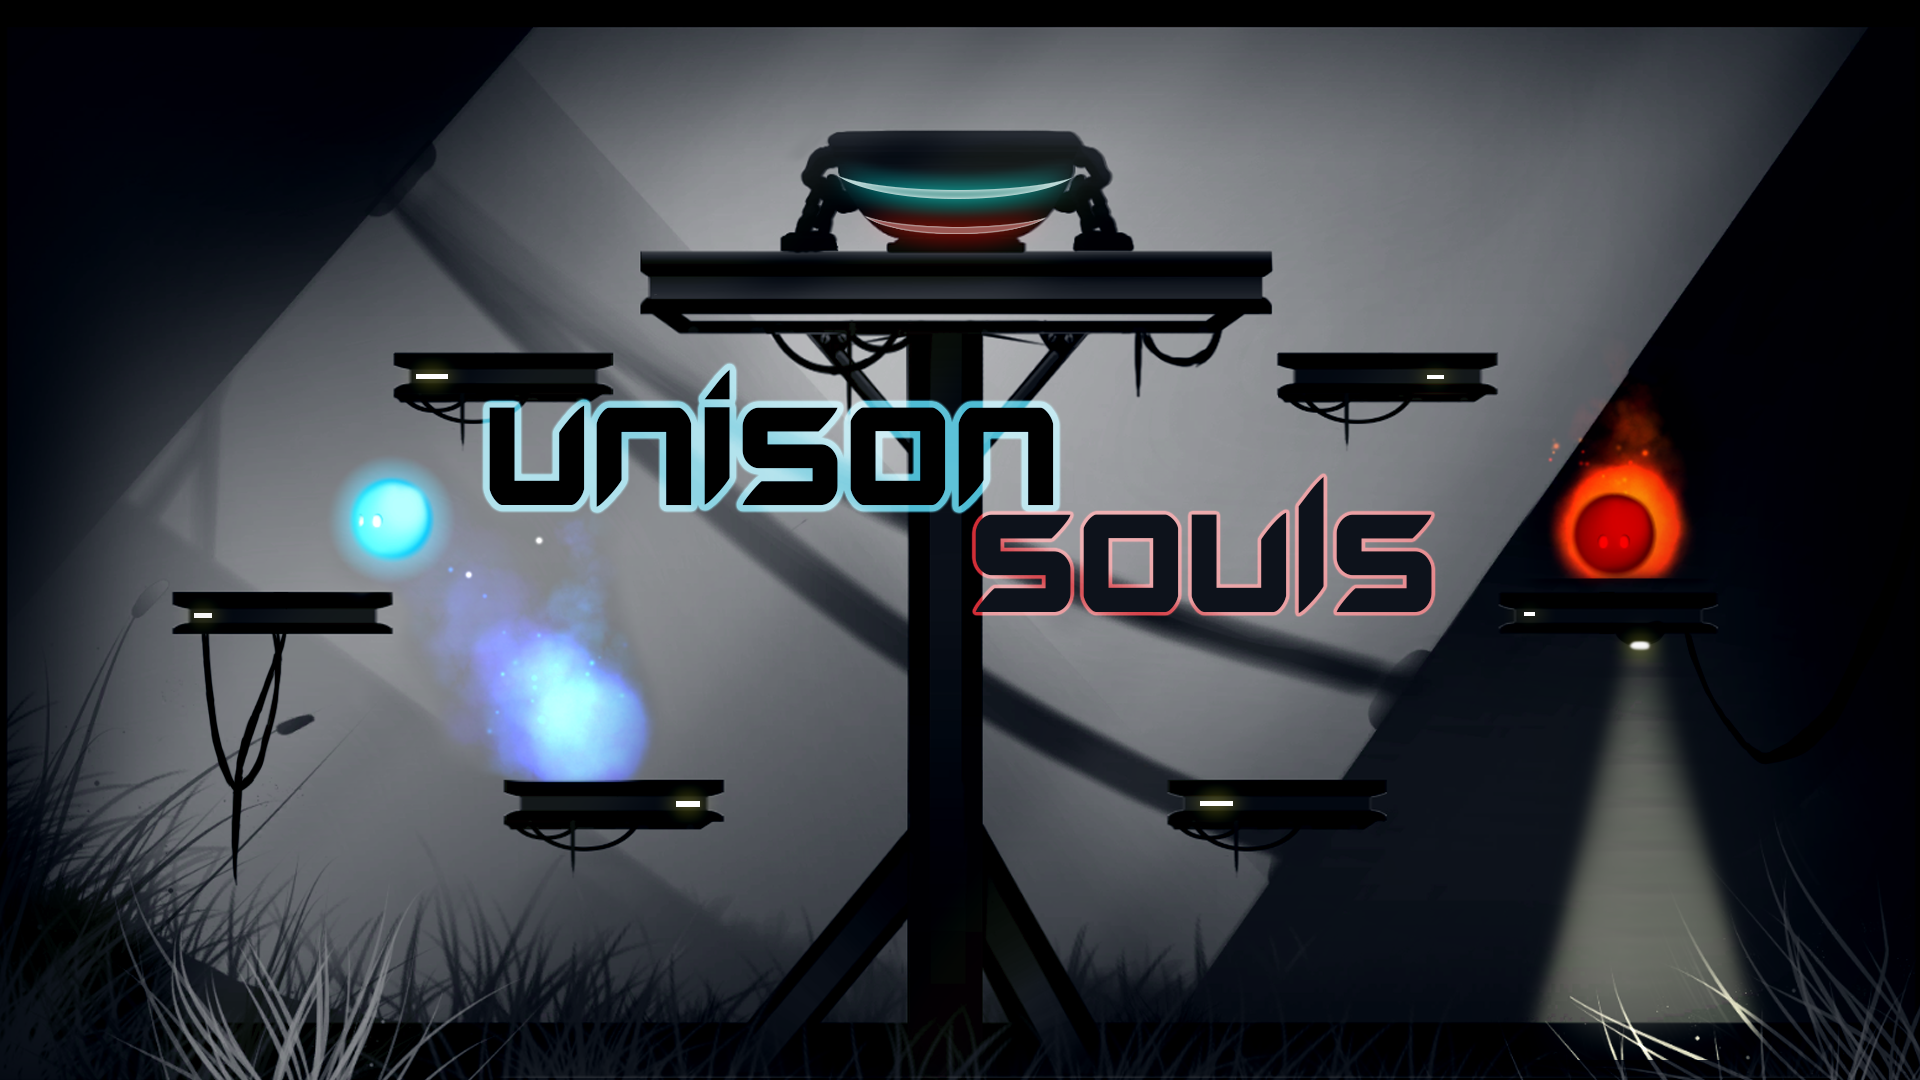 Unison Souls